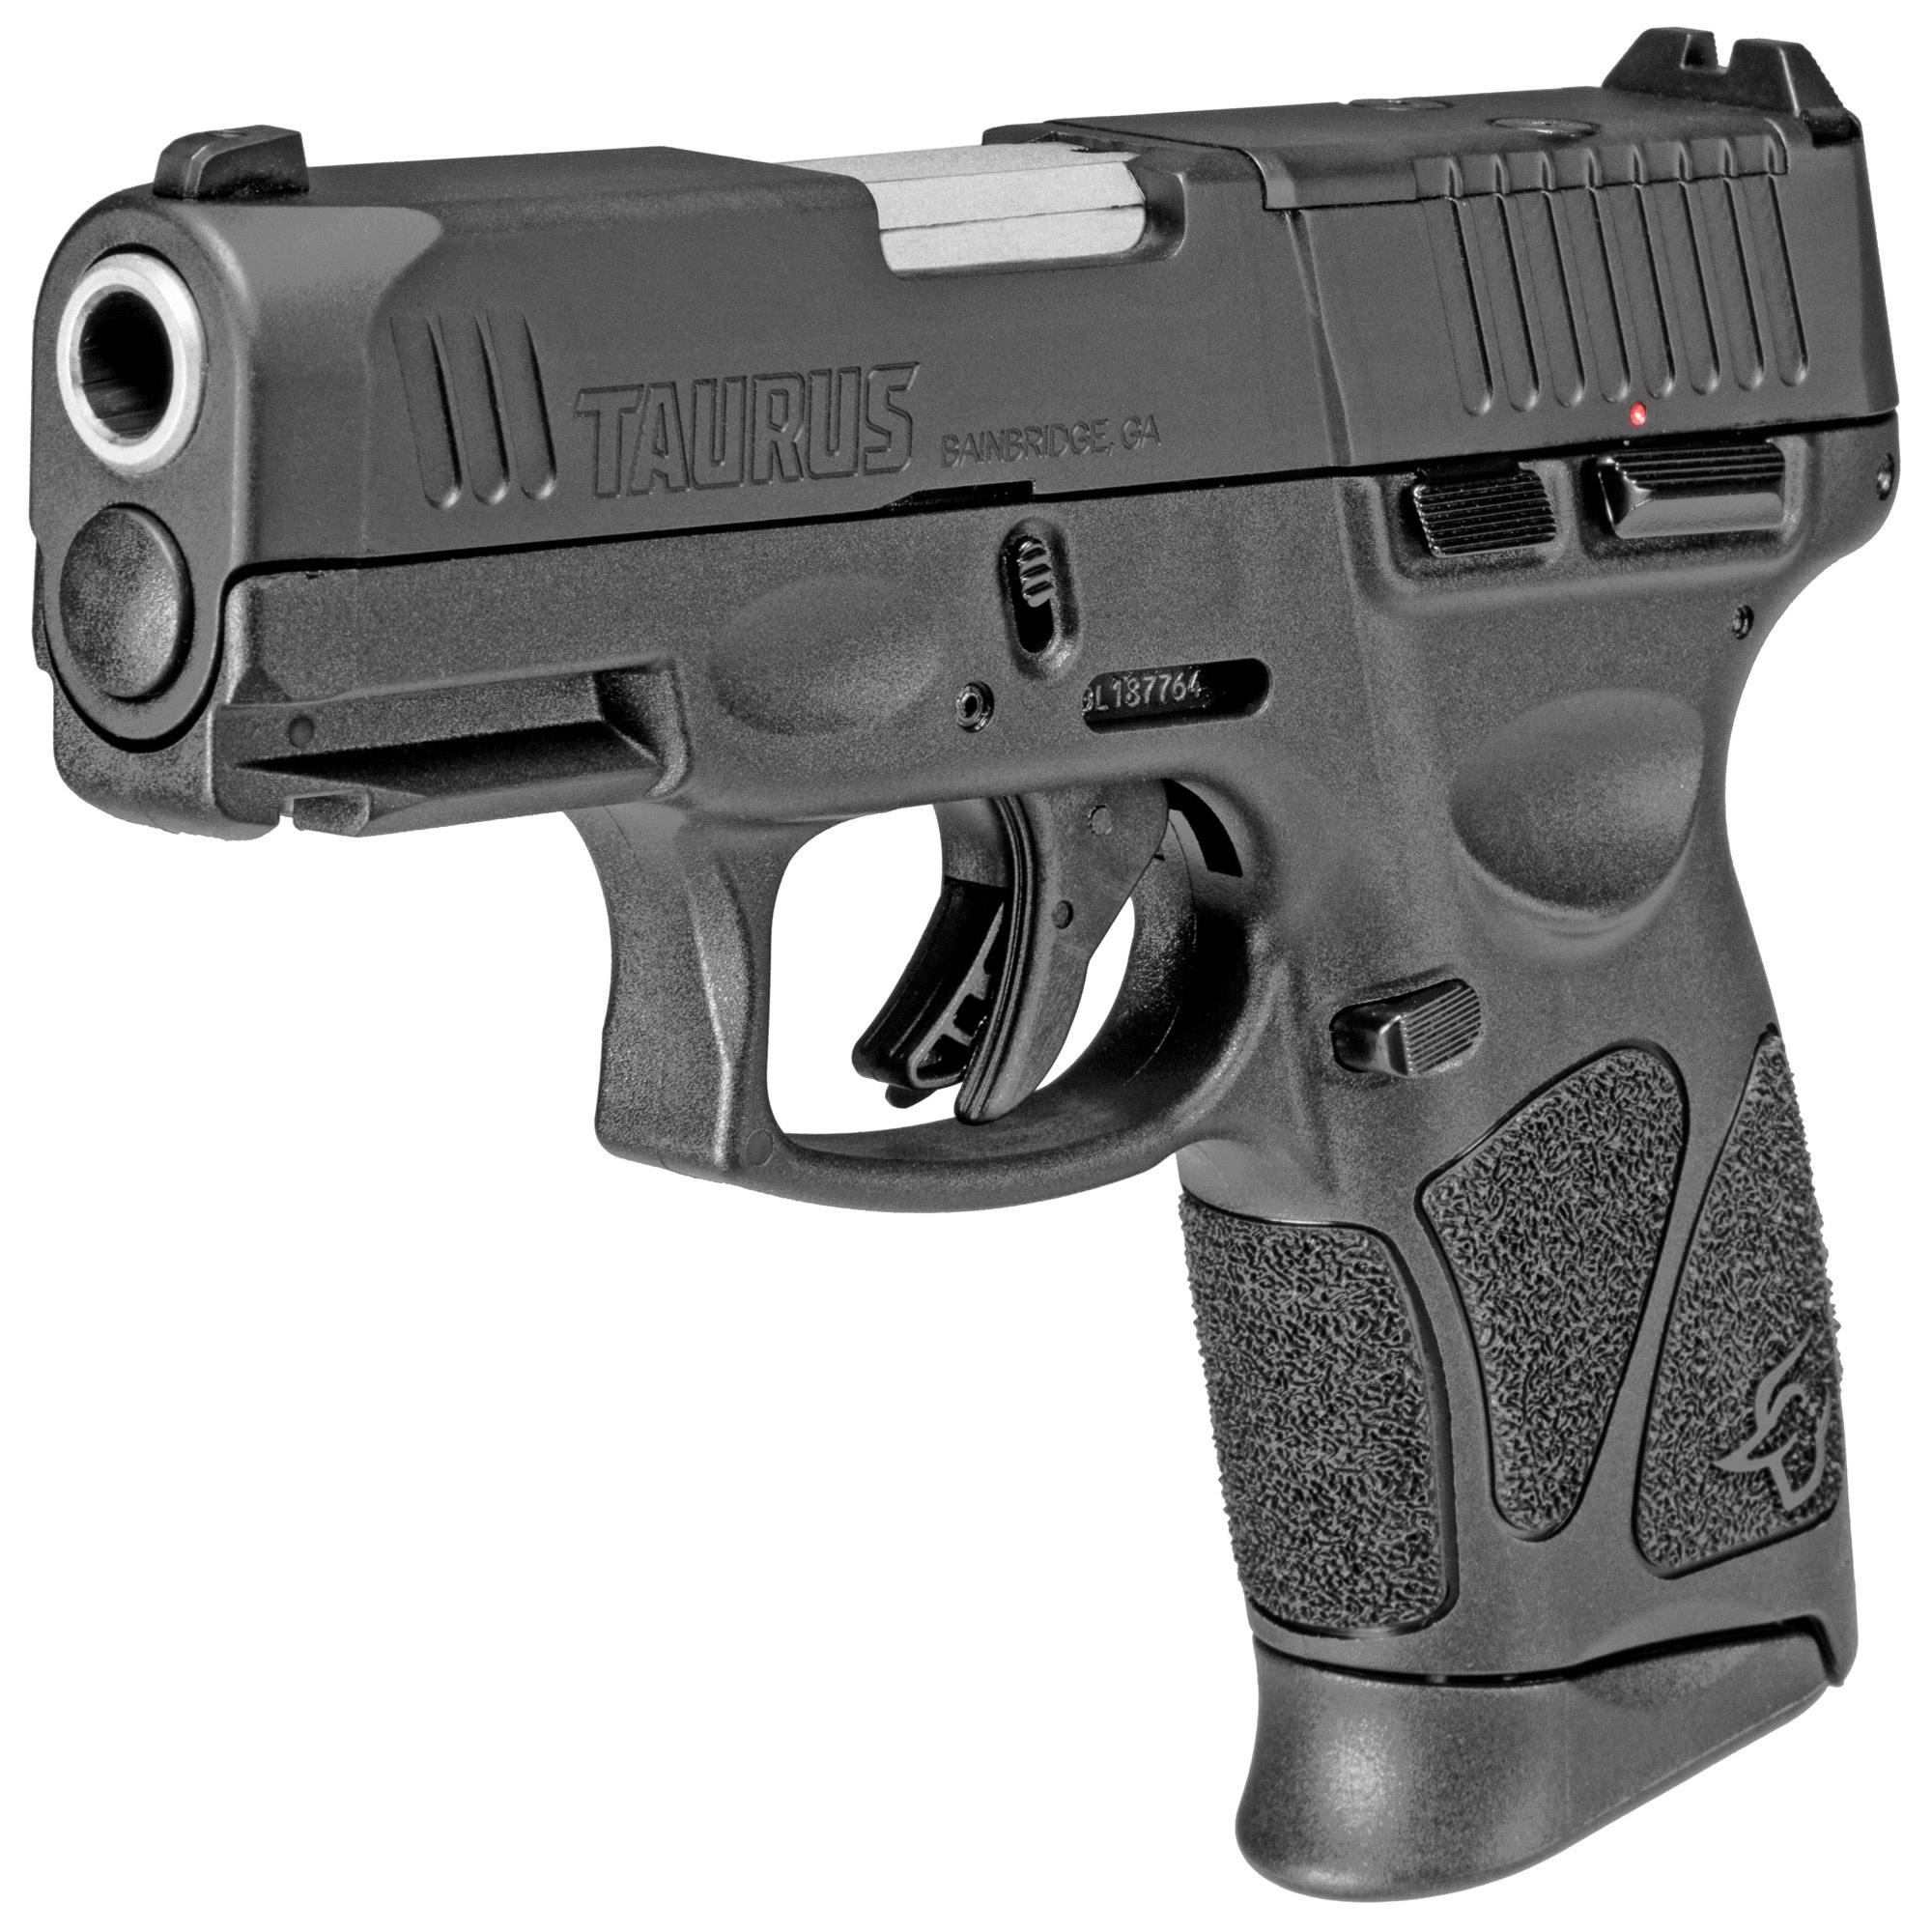 "Taurus G3C, T.O.R.O. (Taurus Optic Ready Option), 9mm, 3.26"", Black, Manual Safety, 12Rd, 3 Magazines"